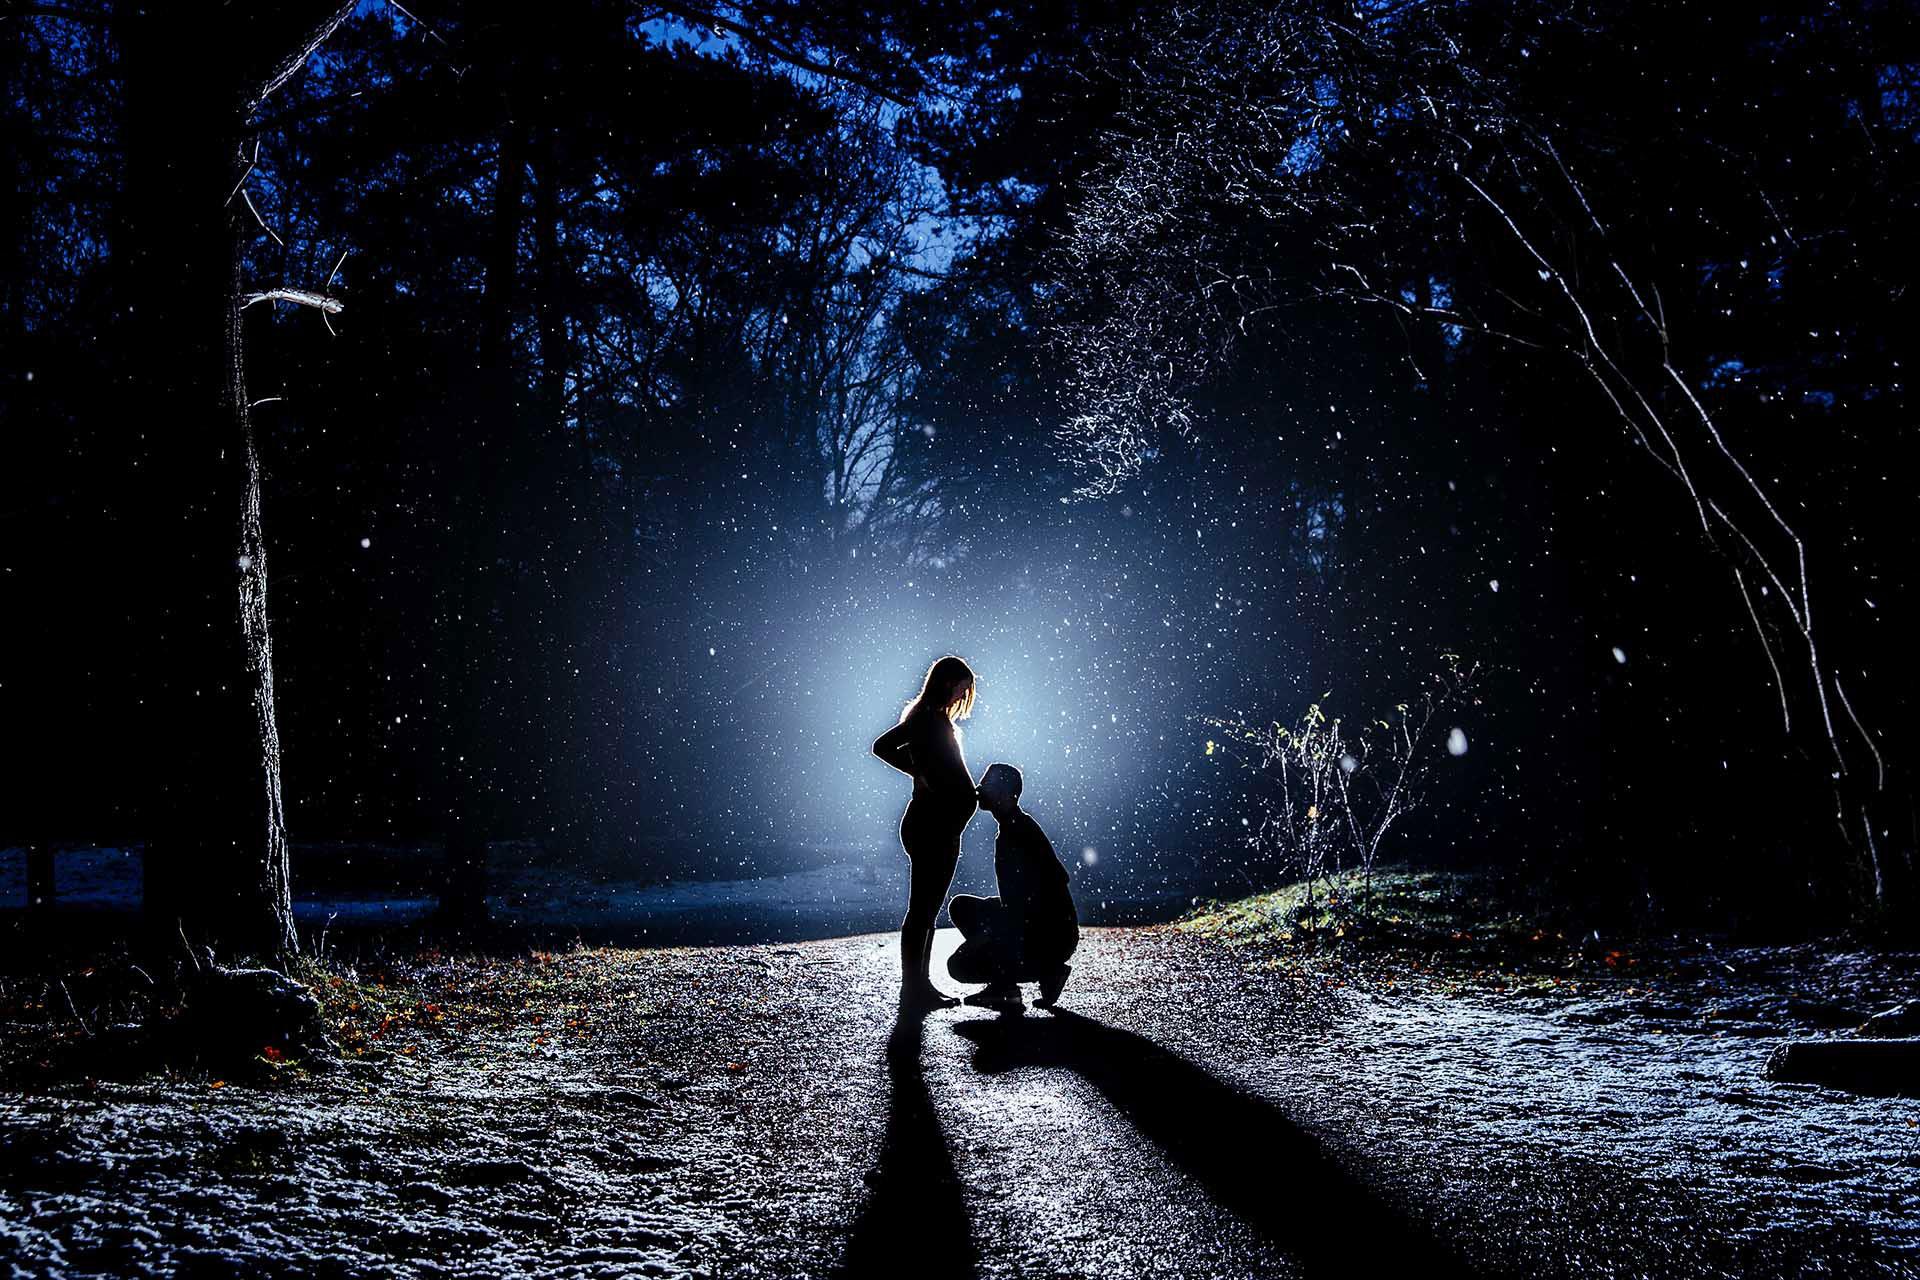 Zwangerschapsshoot in bos 's nachts